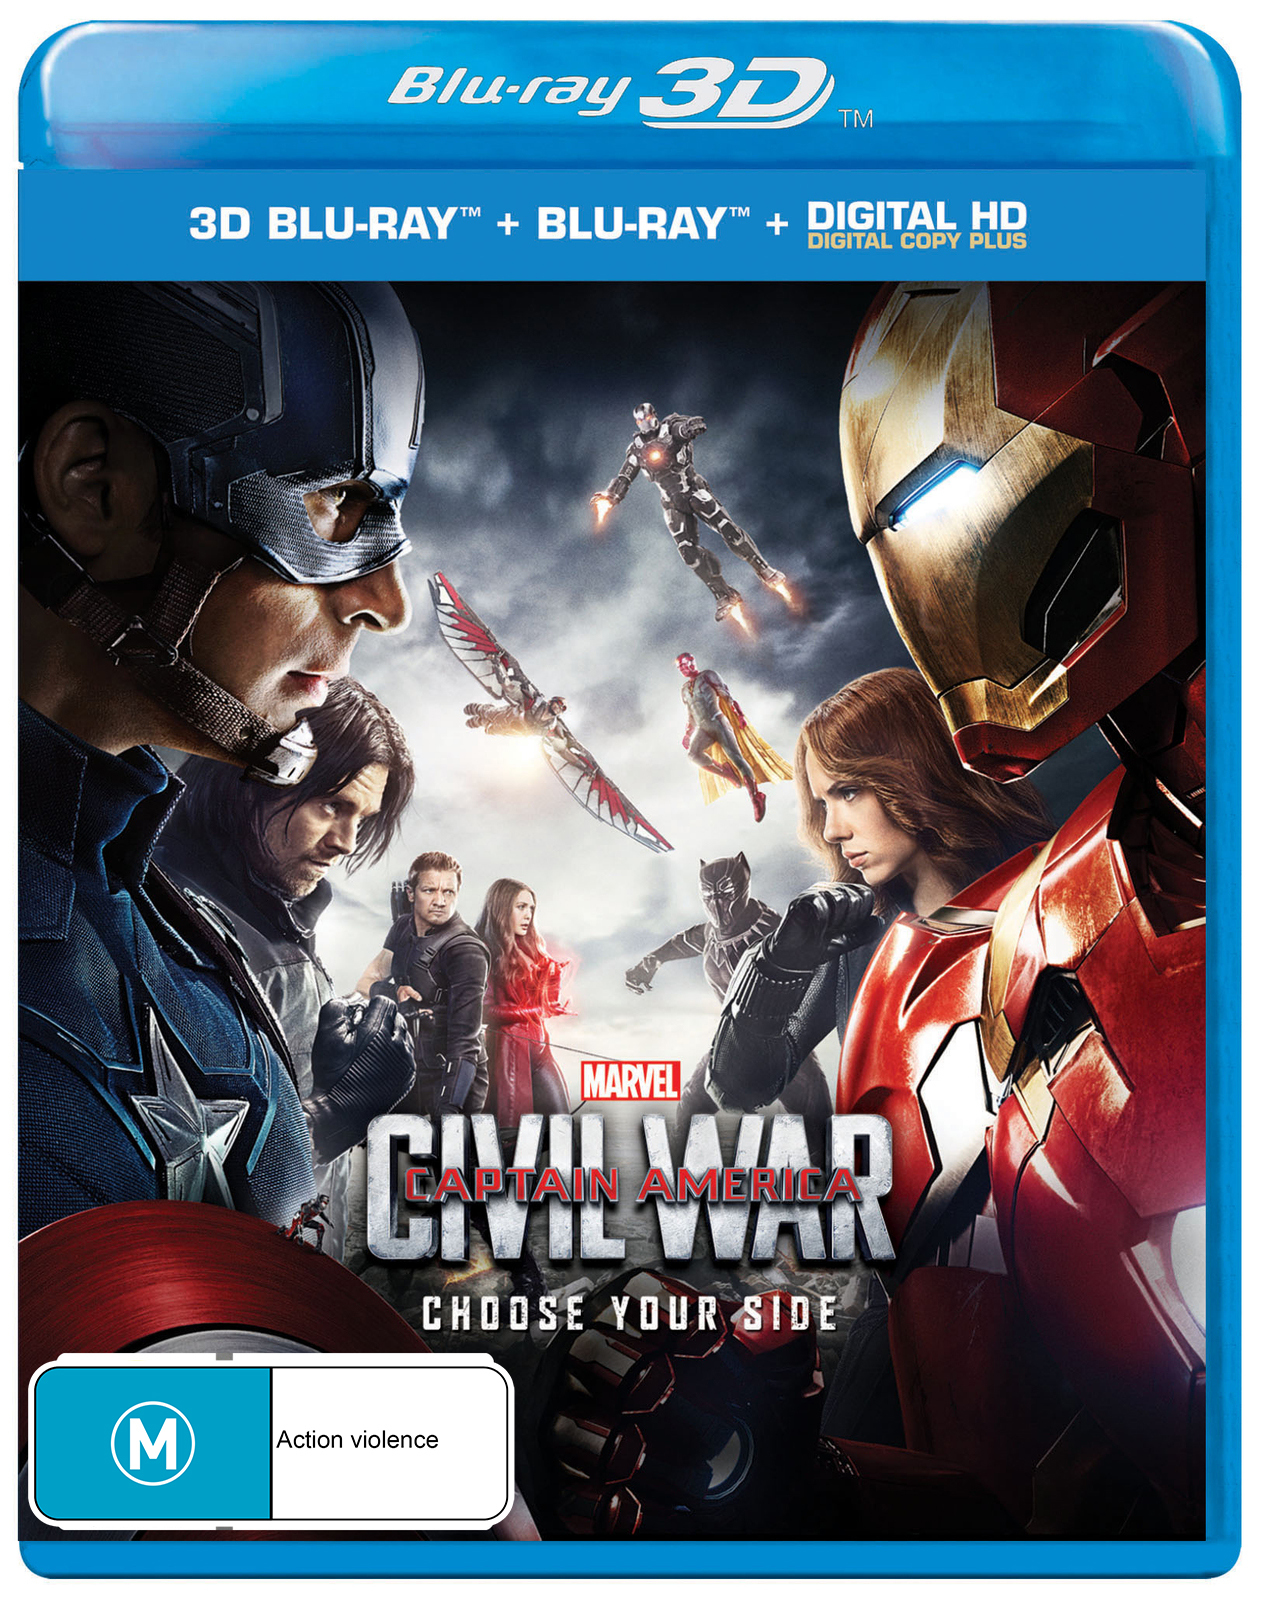 Captain America: Civil War on Blu-ray, 3D Blu-ray, DC+ image